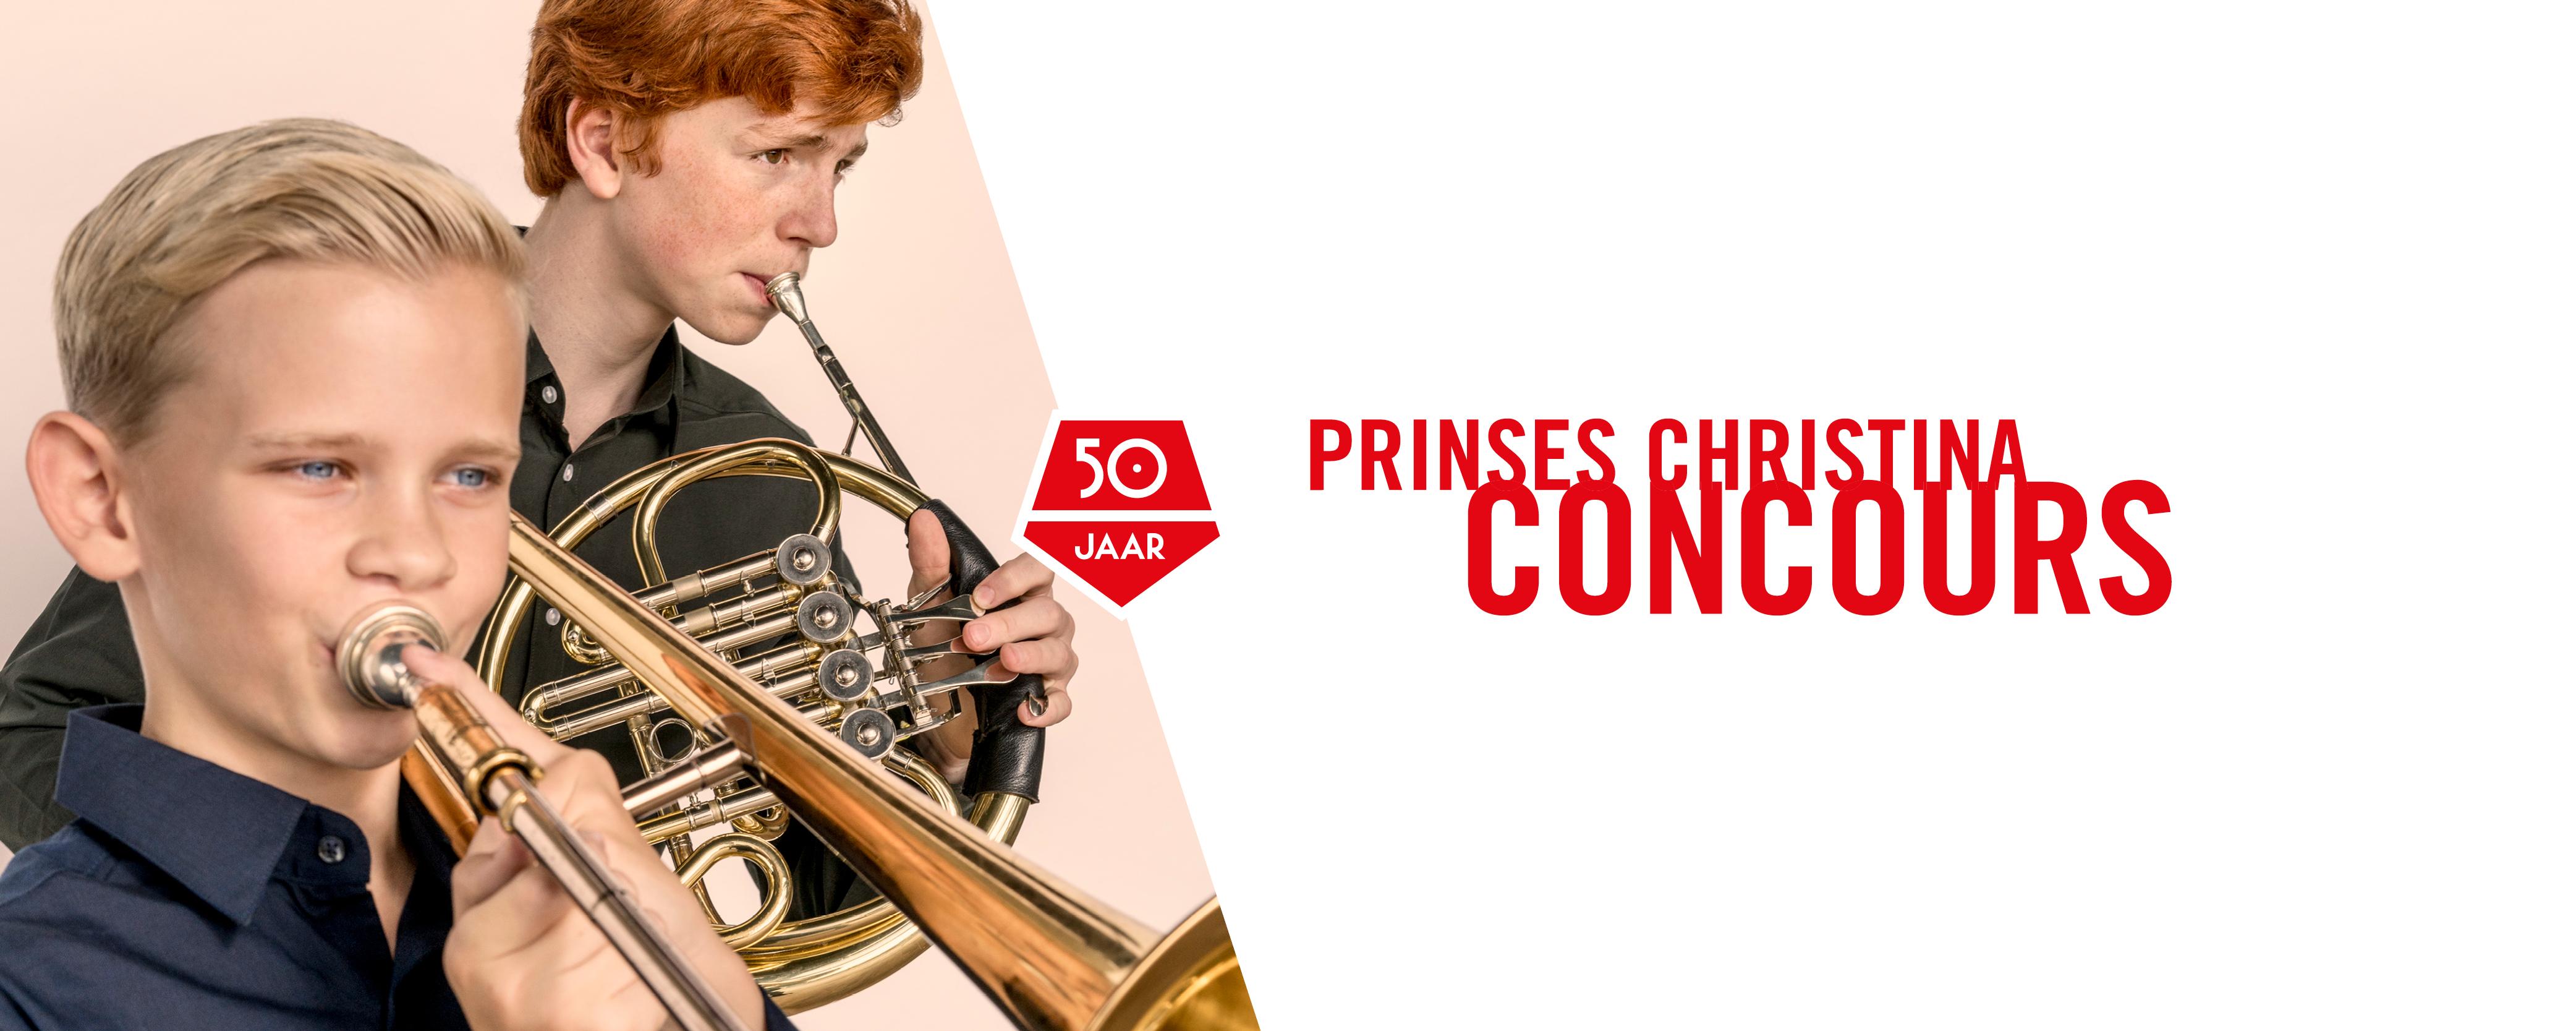 Het Prinses Christina Concours